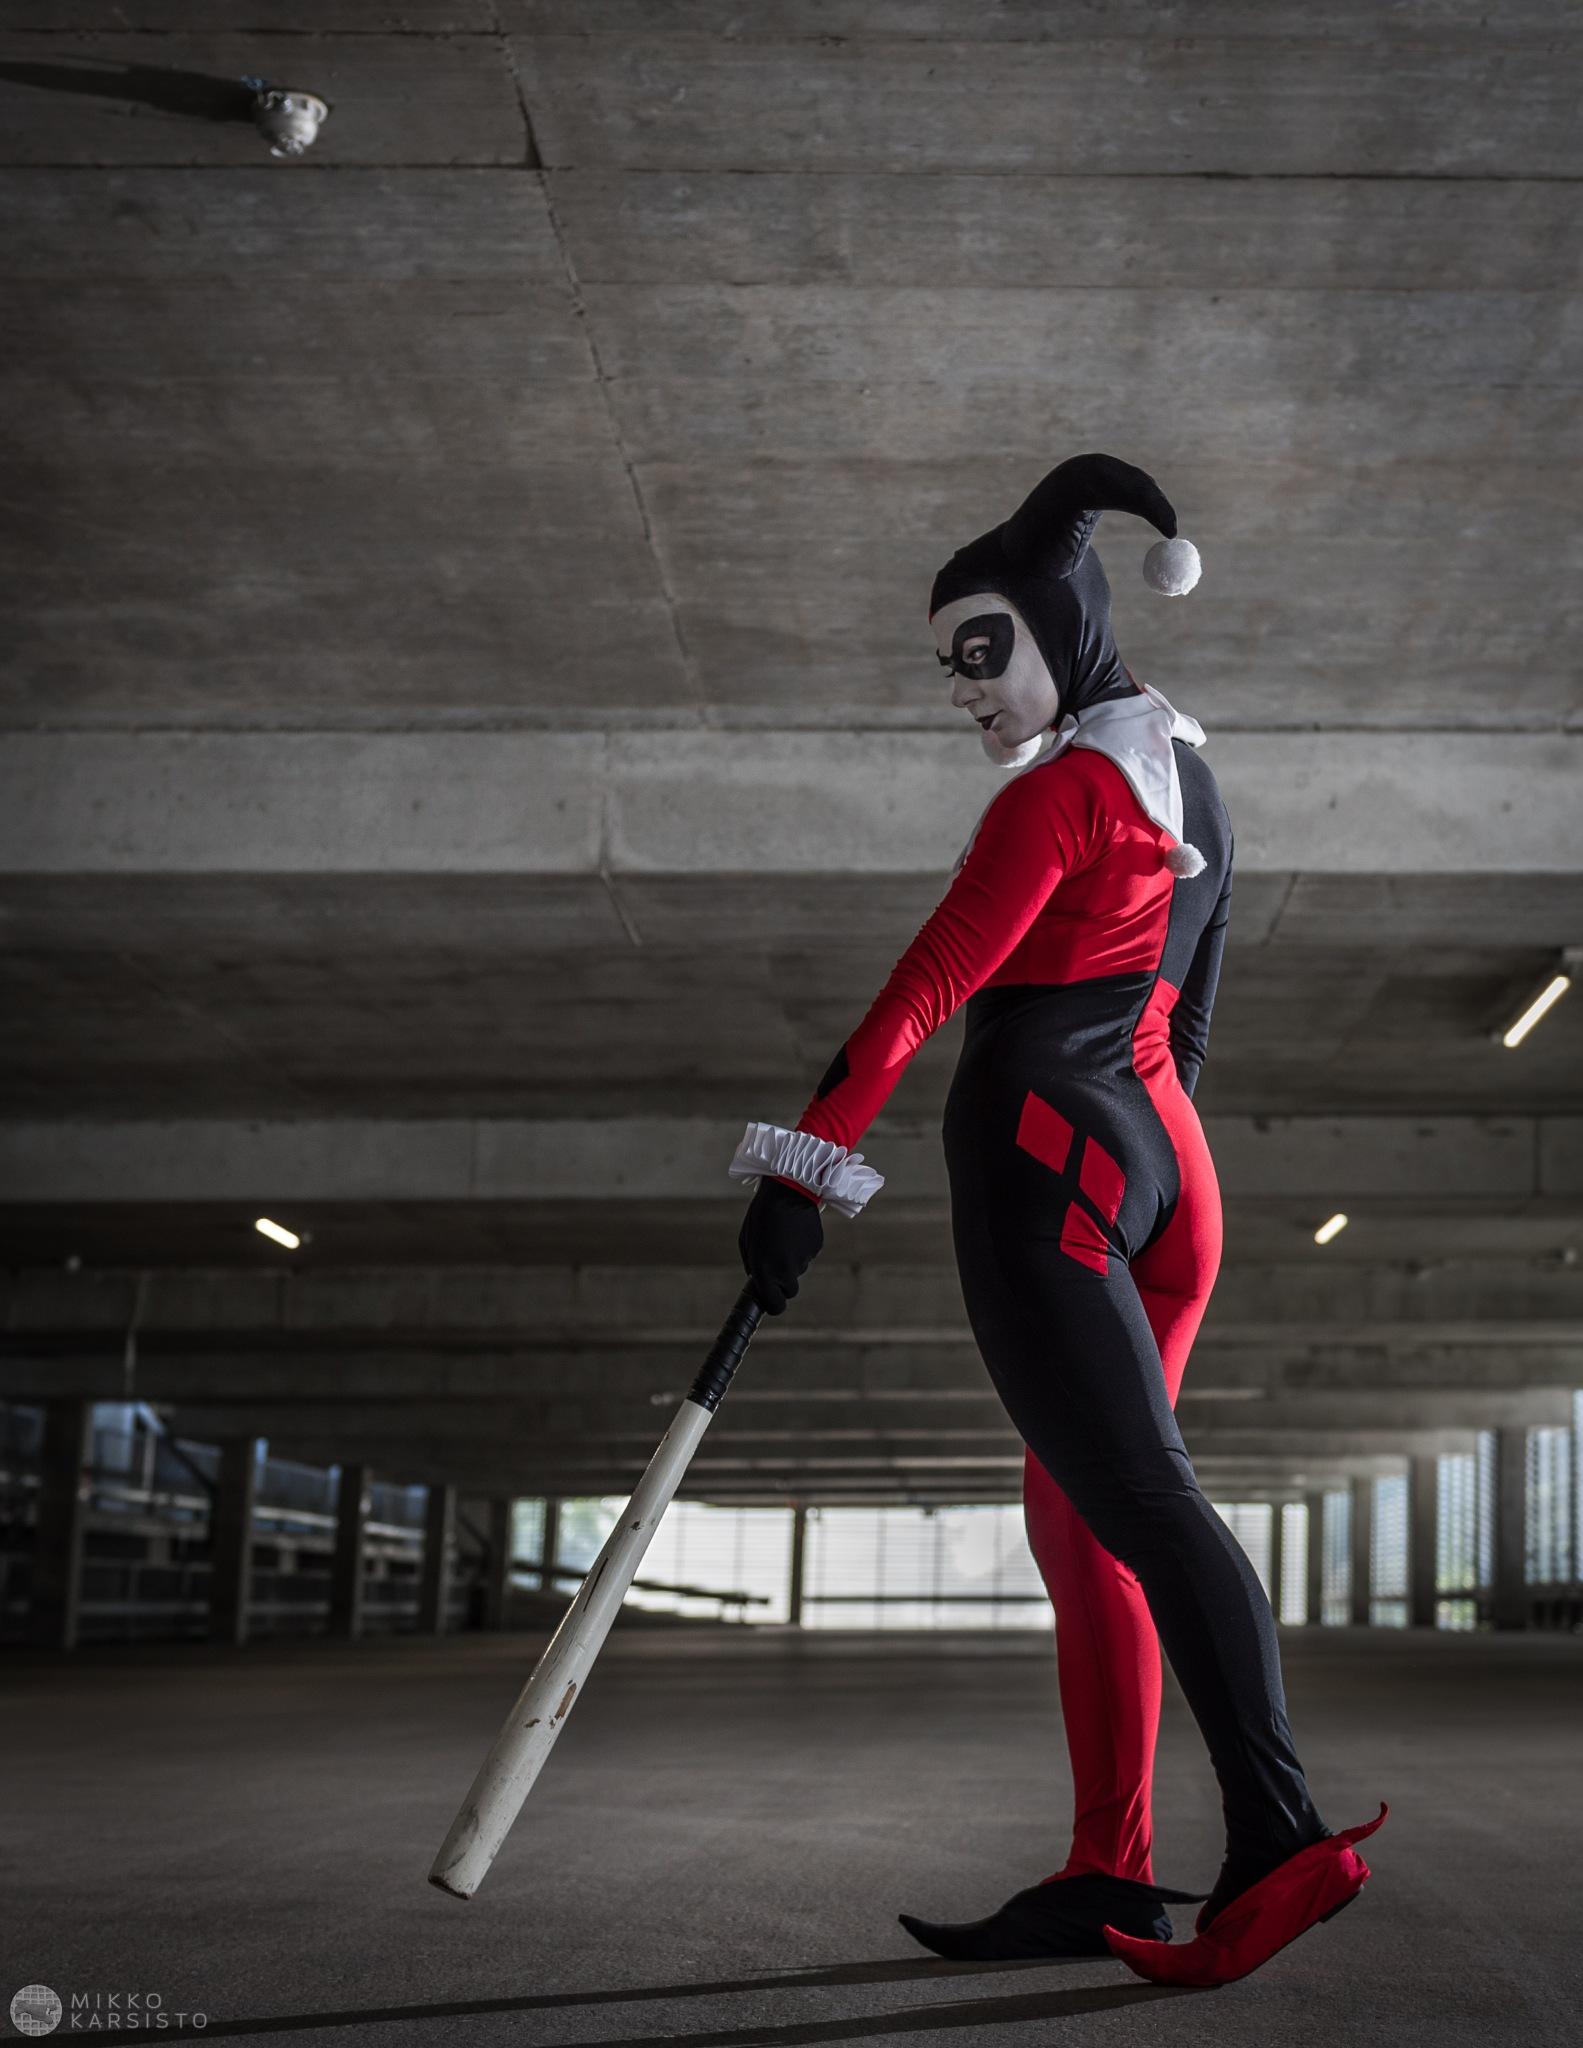 Harley Quinn by Mikko Karsisto